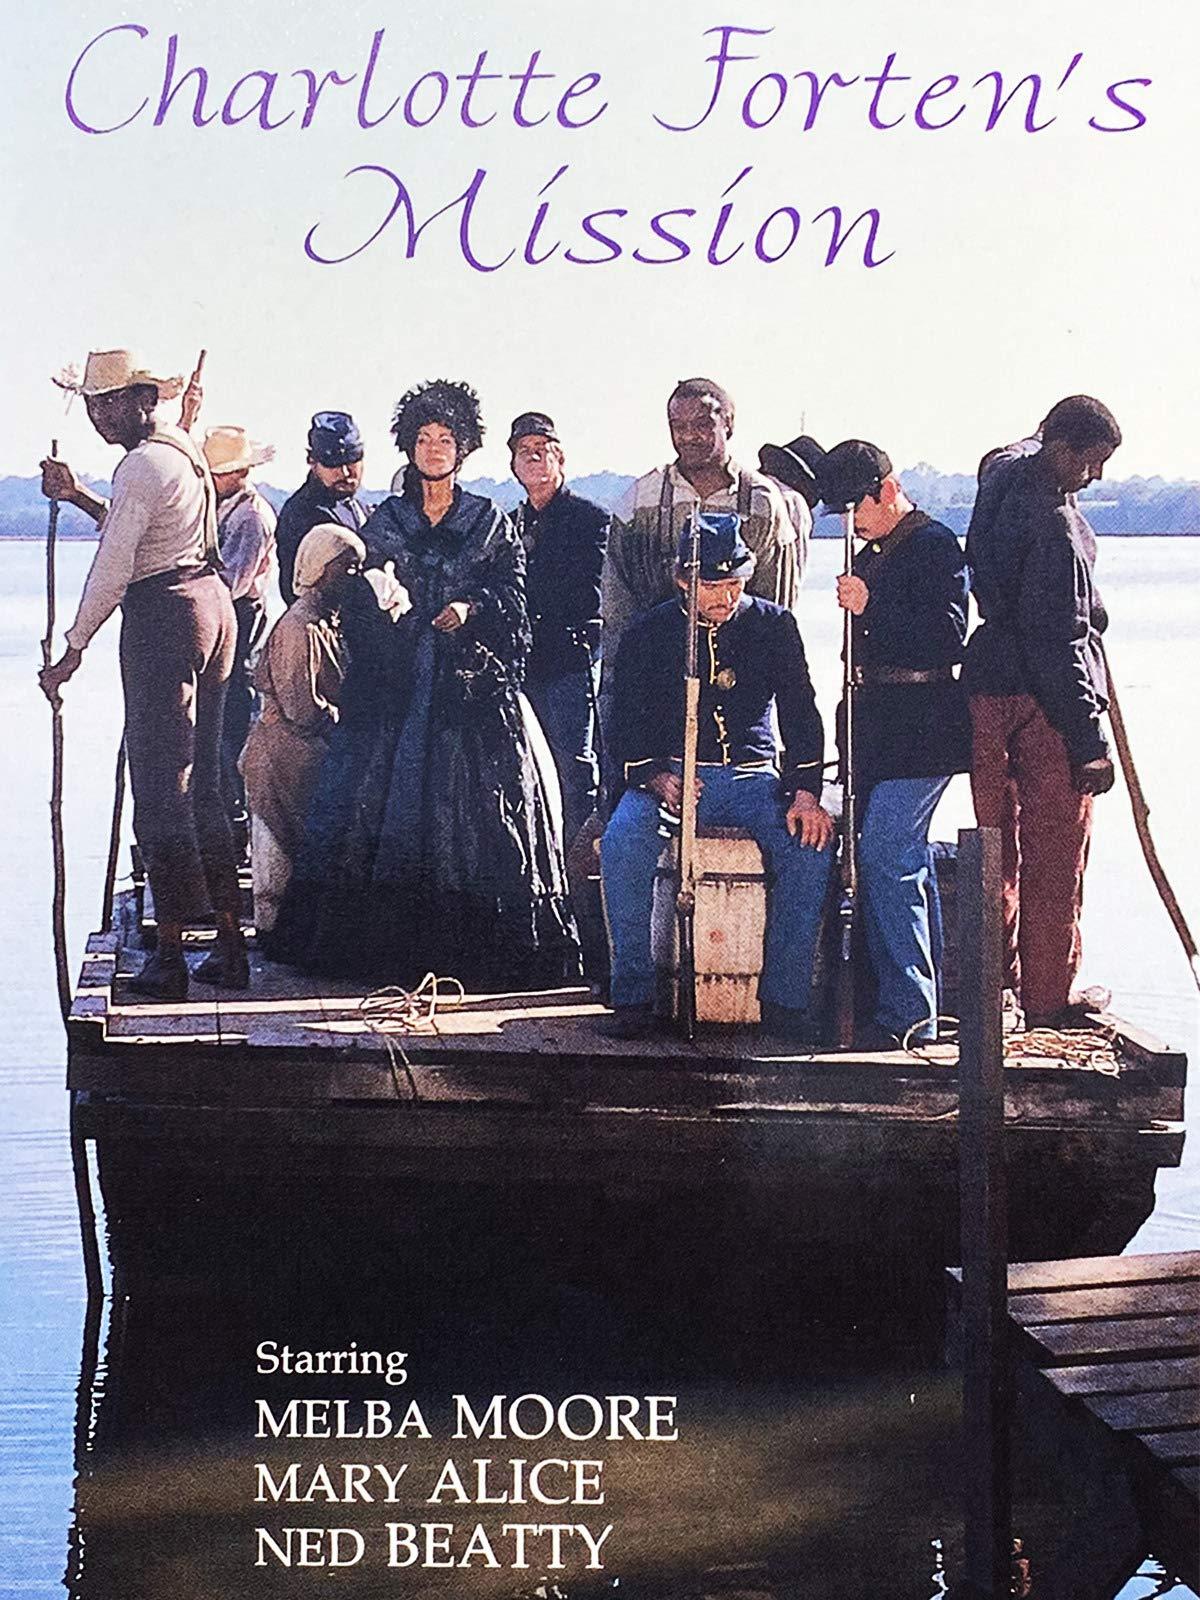 Charlotte Forten's Mission